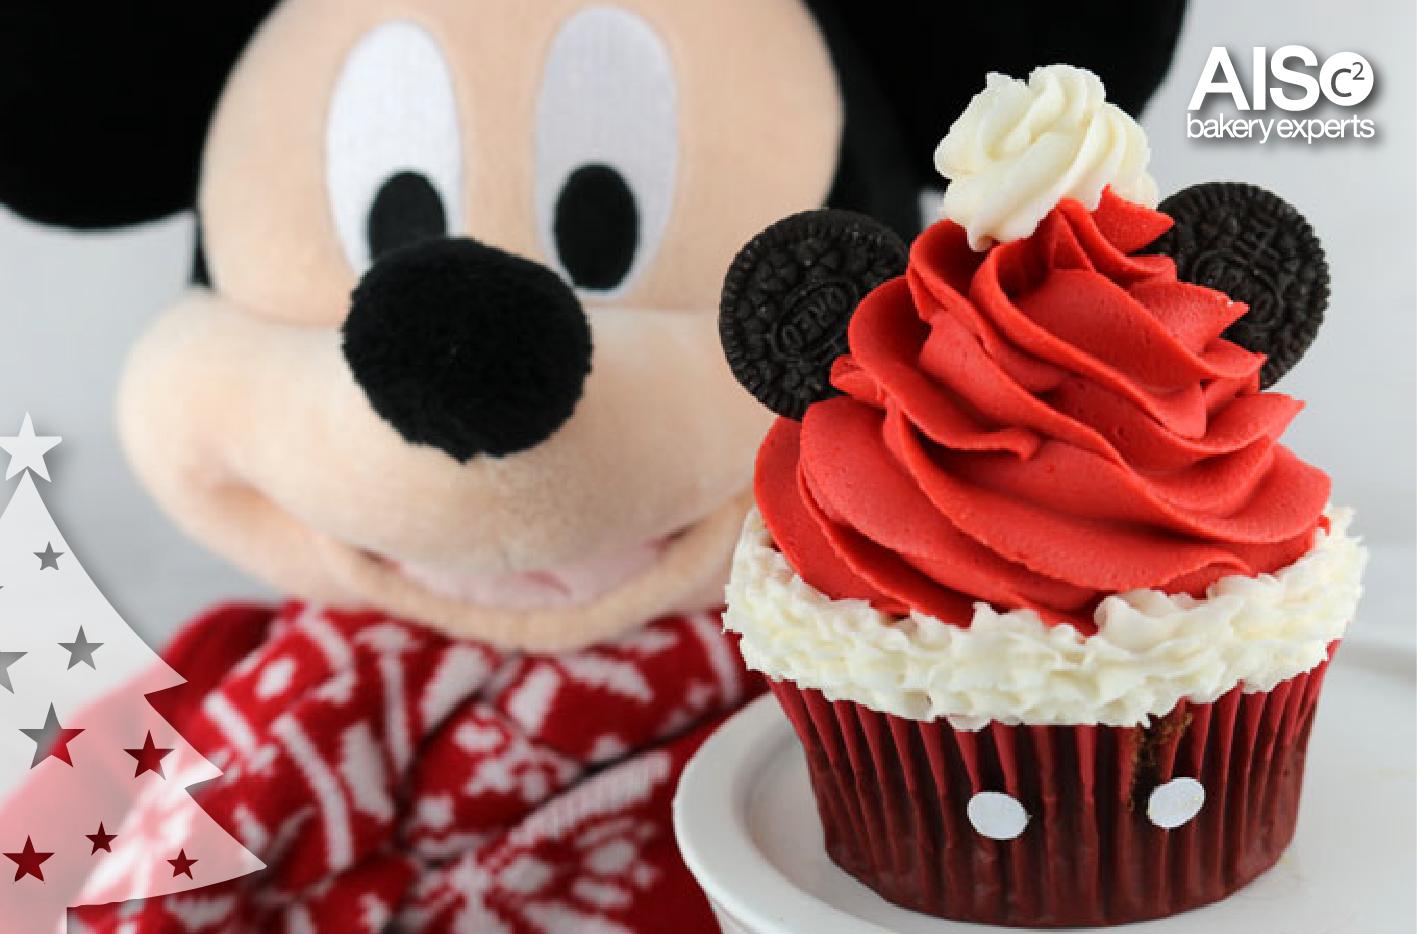 Divertida Idea Para Decorar Cupcakes De Micky Mouse Decoralos Con